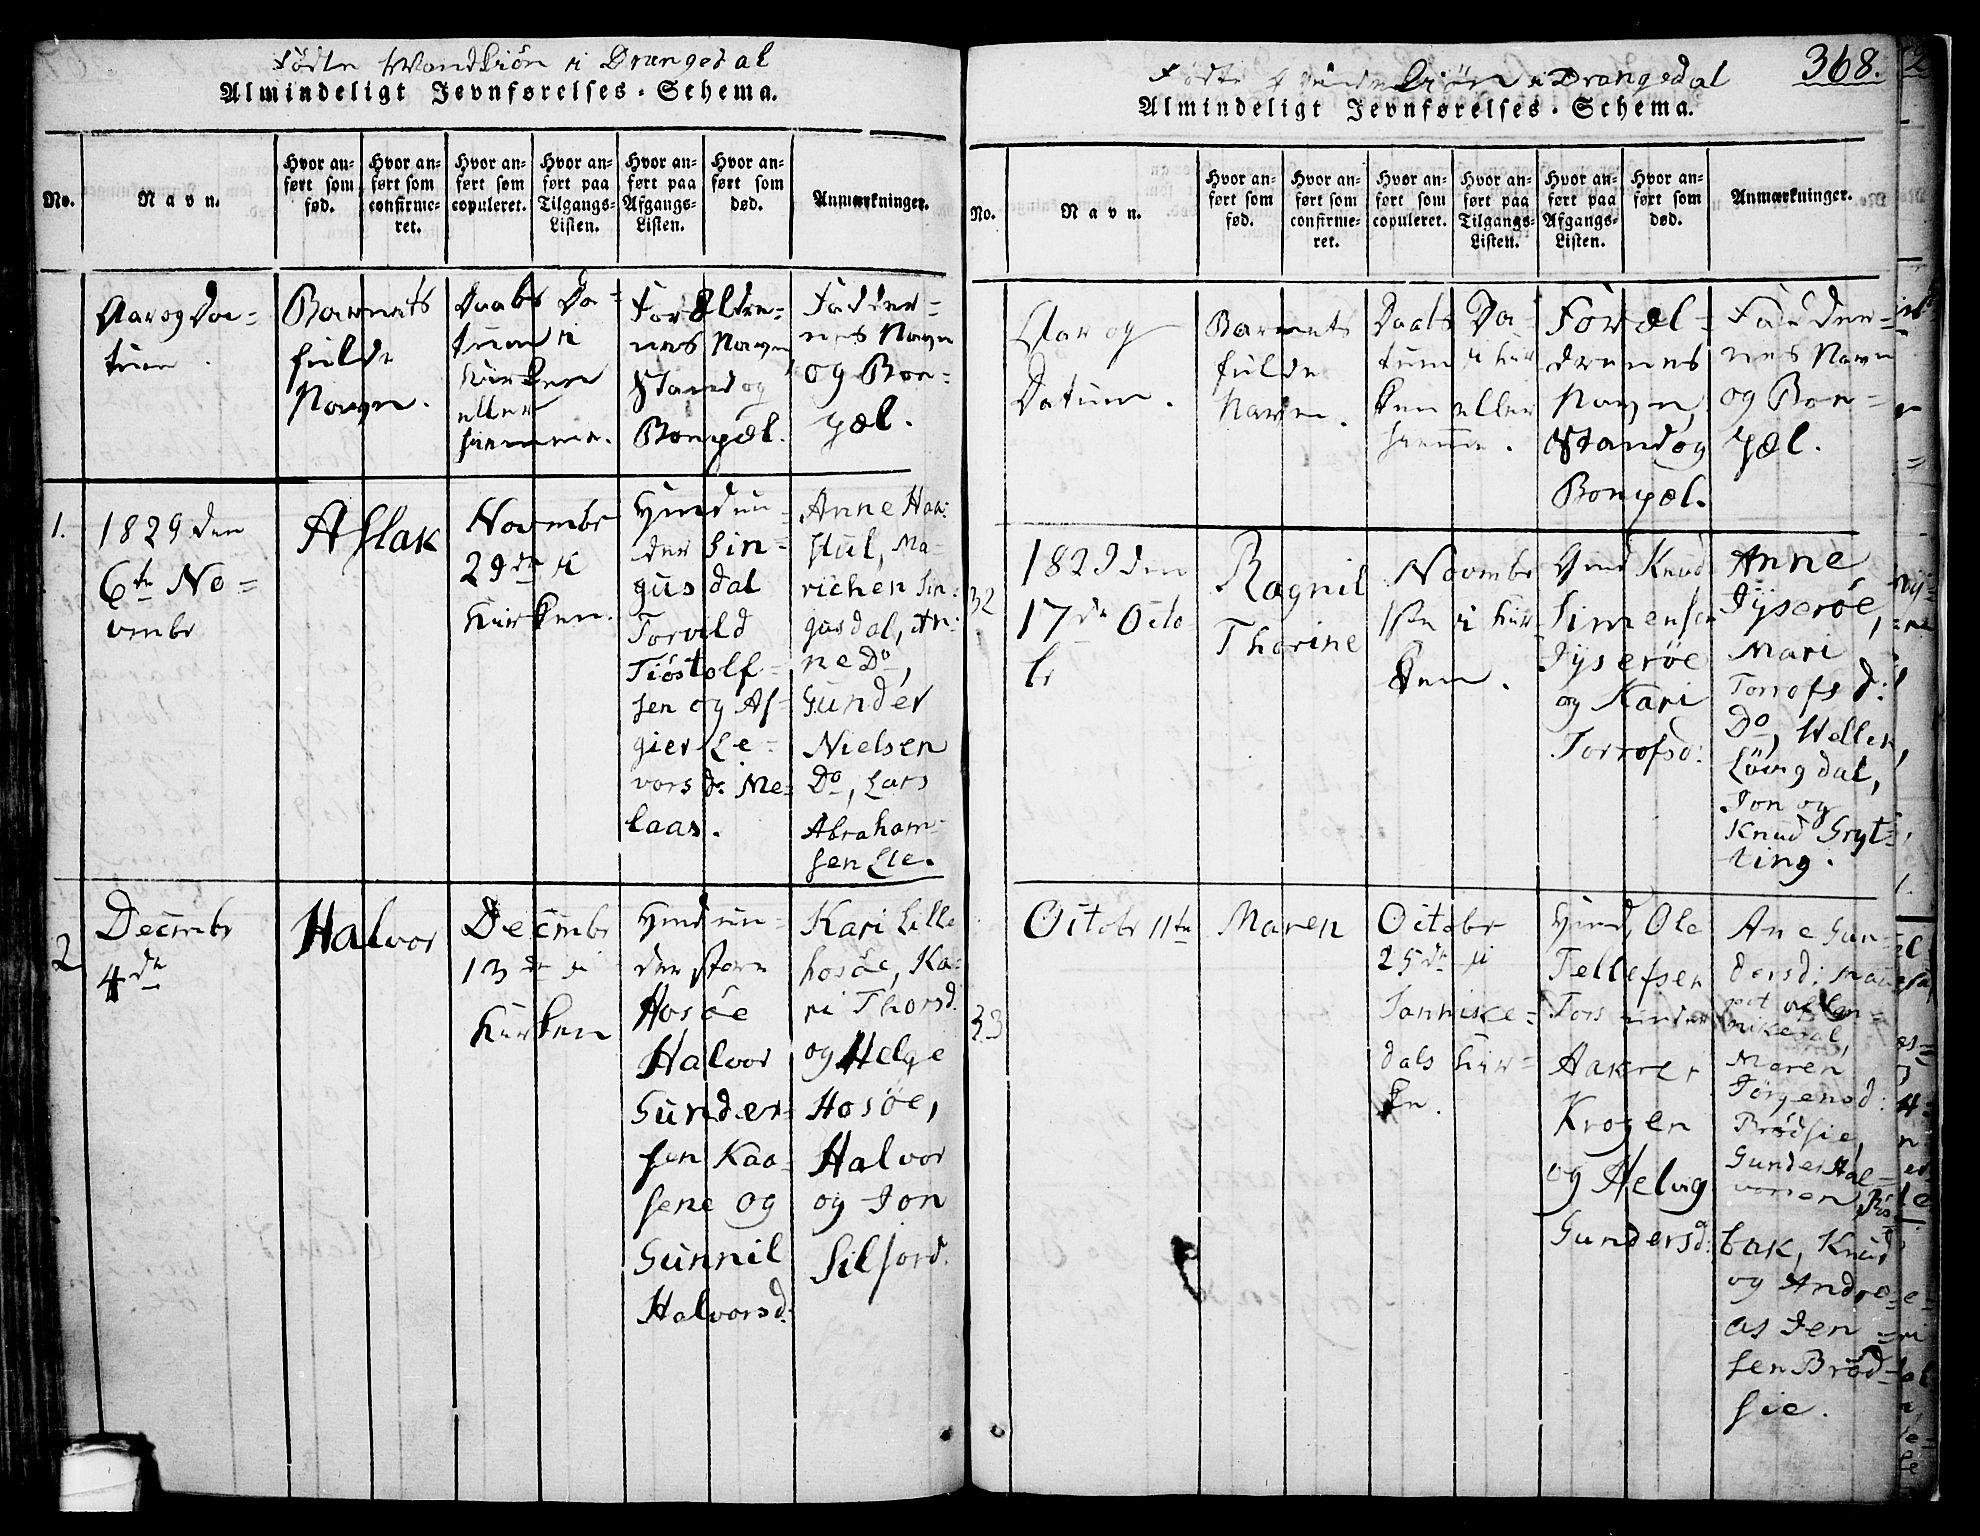 SAKO, Drangedal kirkebøker, F/Fa/L0005: Ministerialbok nr. 5 /1, 1814-1831, s. 368